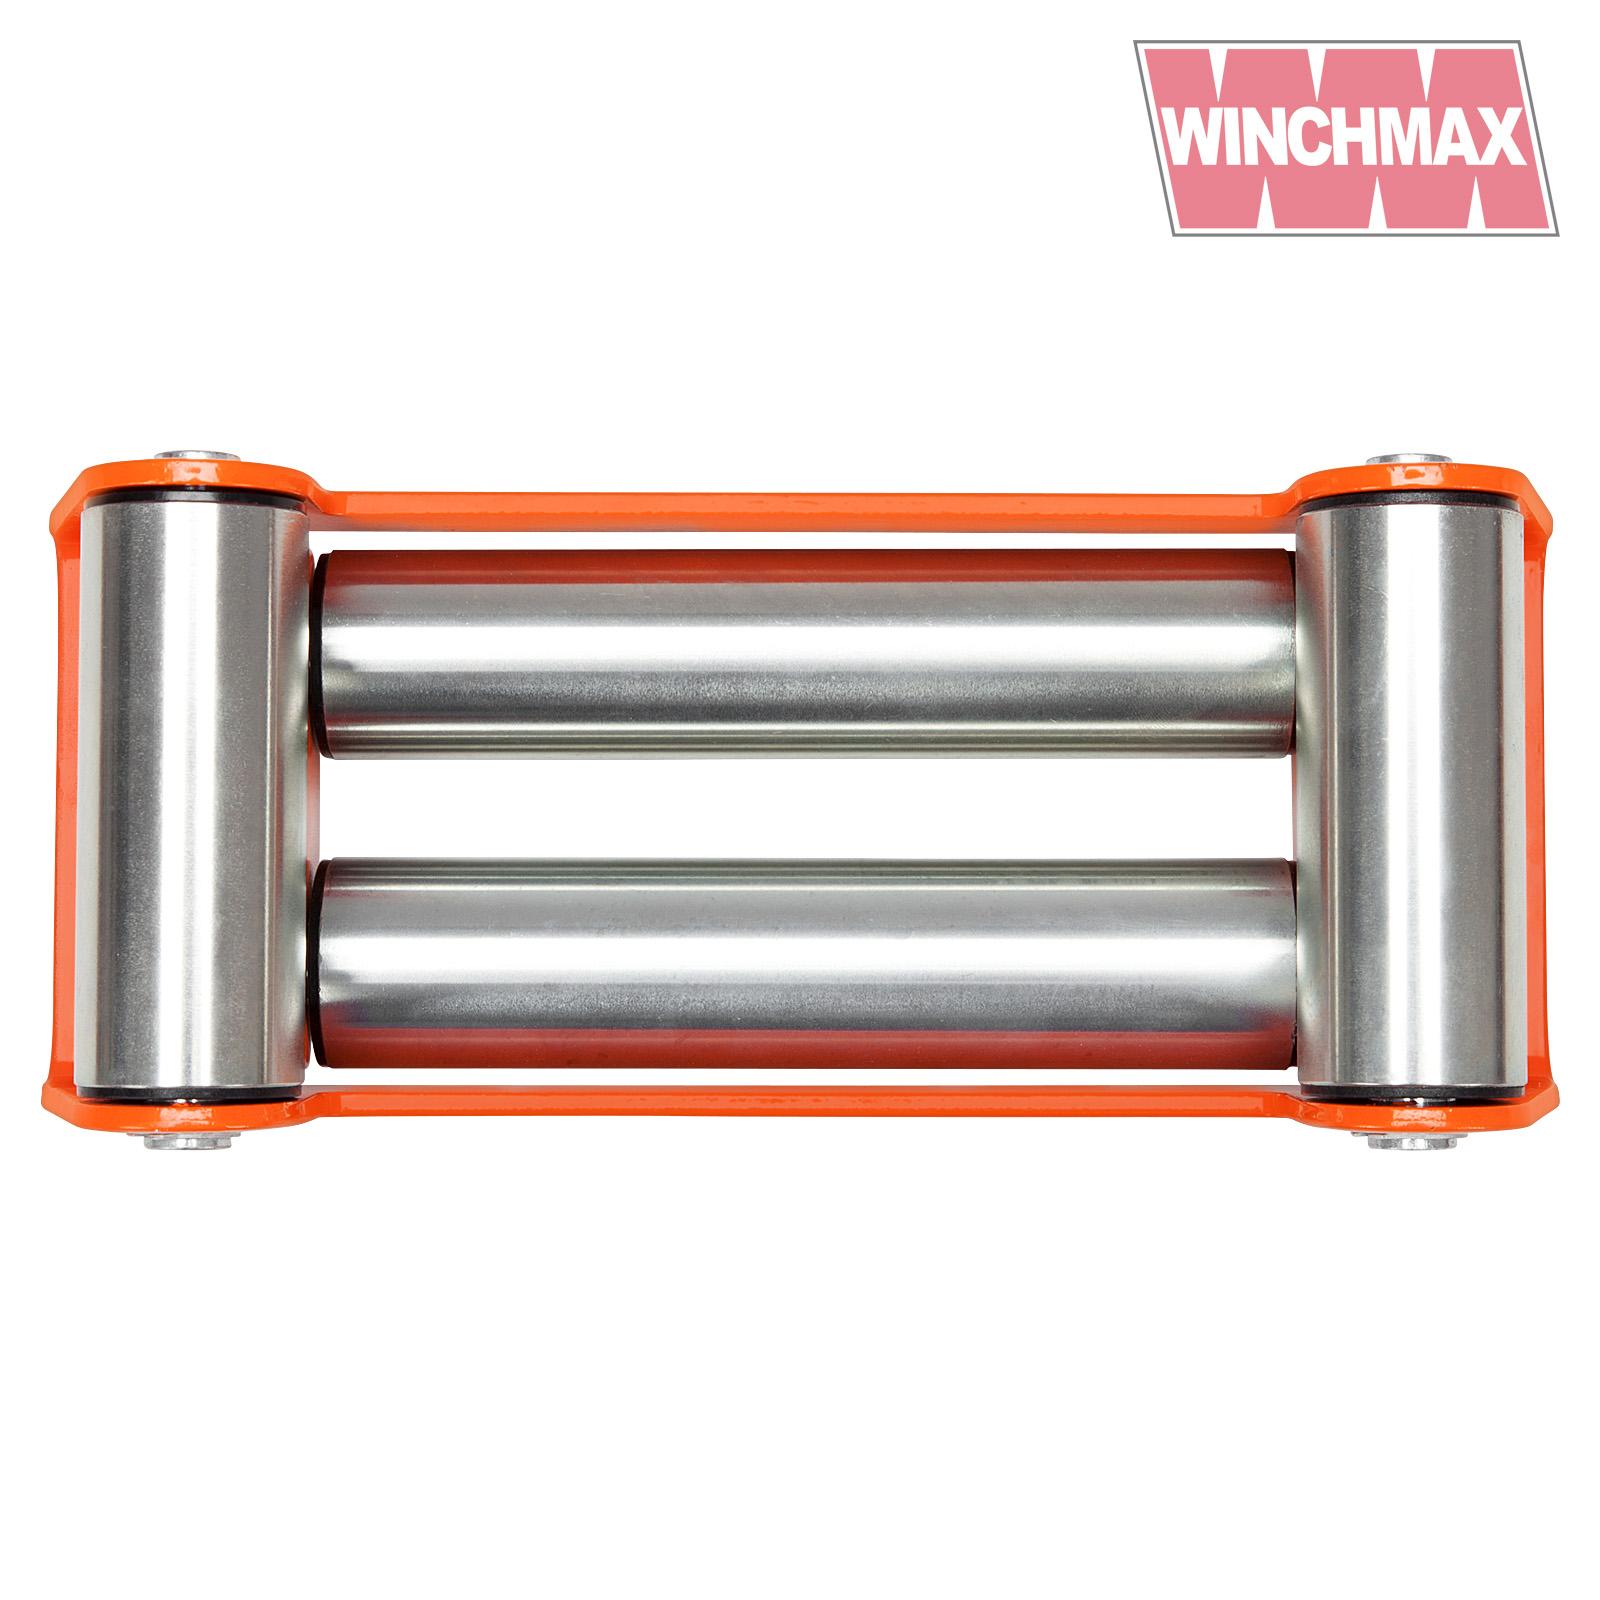 Wmrfo winchmax 321